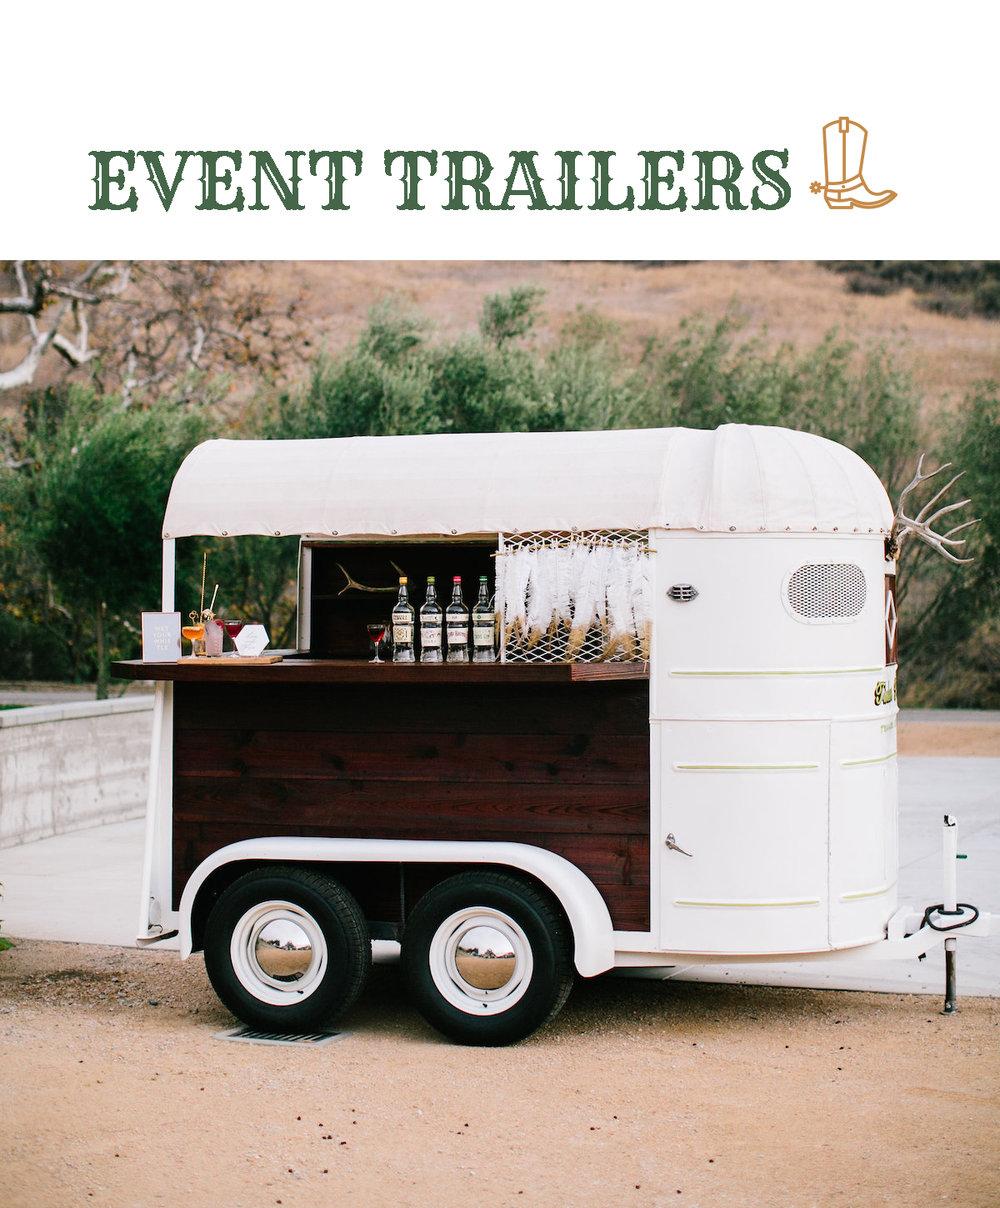 Event Trailers RYE.jpg